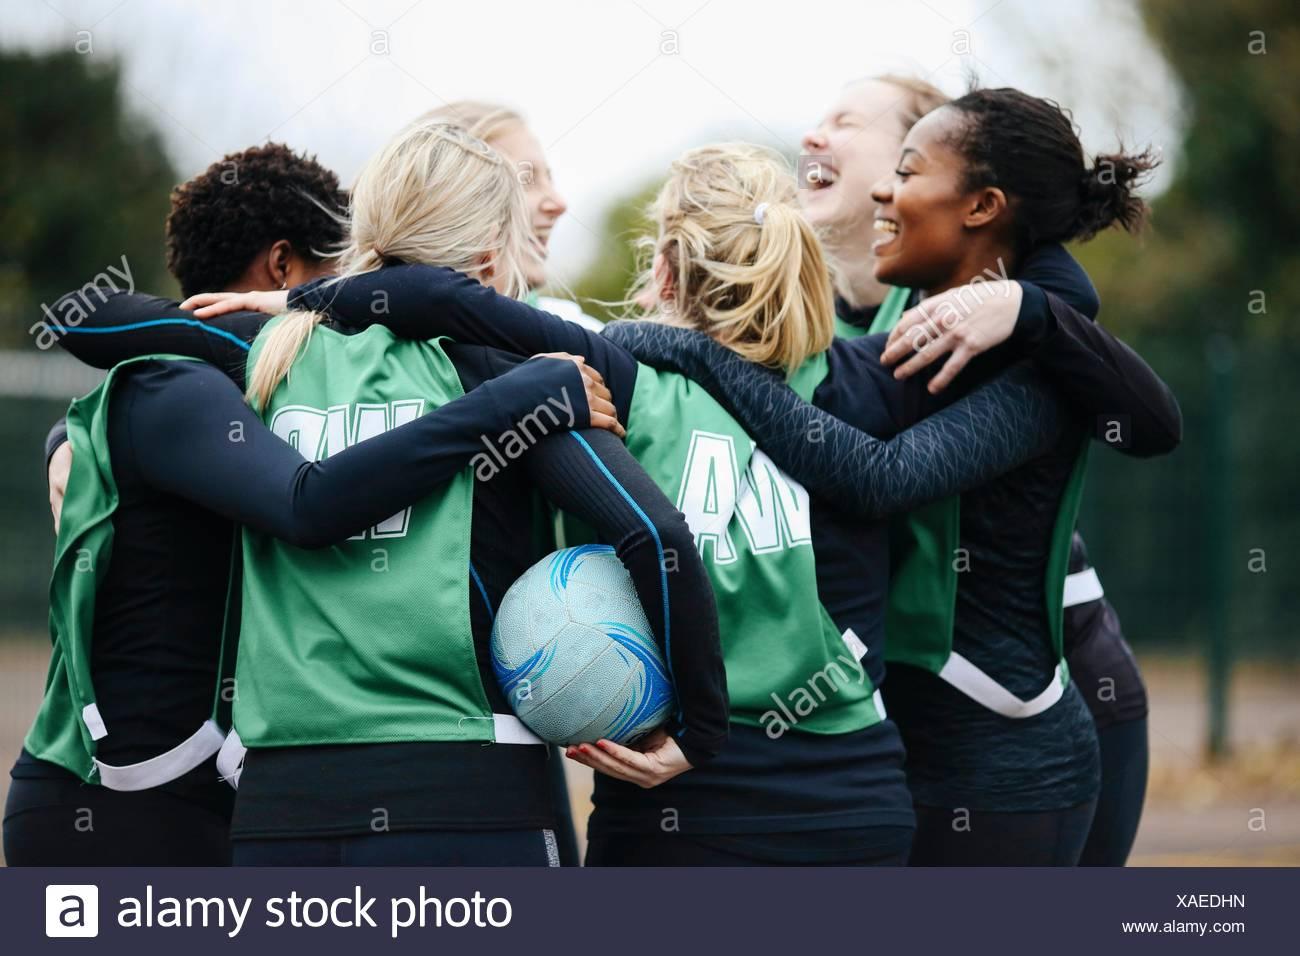 Equipo de baloncesto femenino celebrando en se apiñan en corte de baloncesto Imagen De Stock